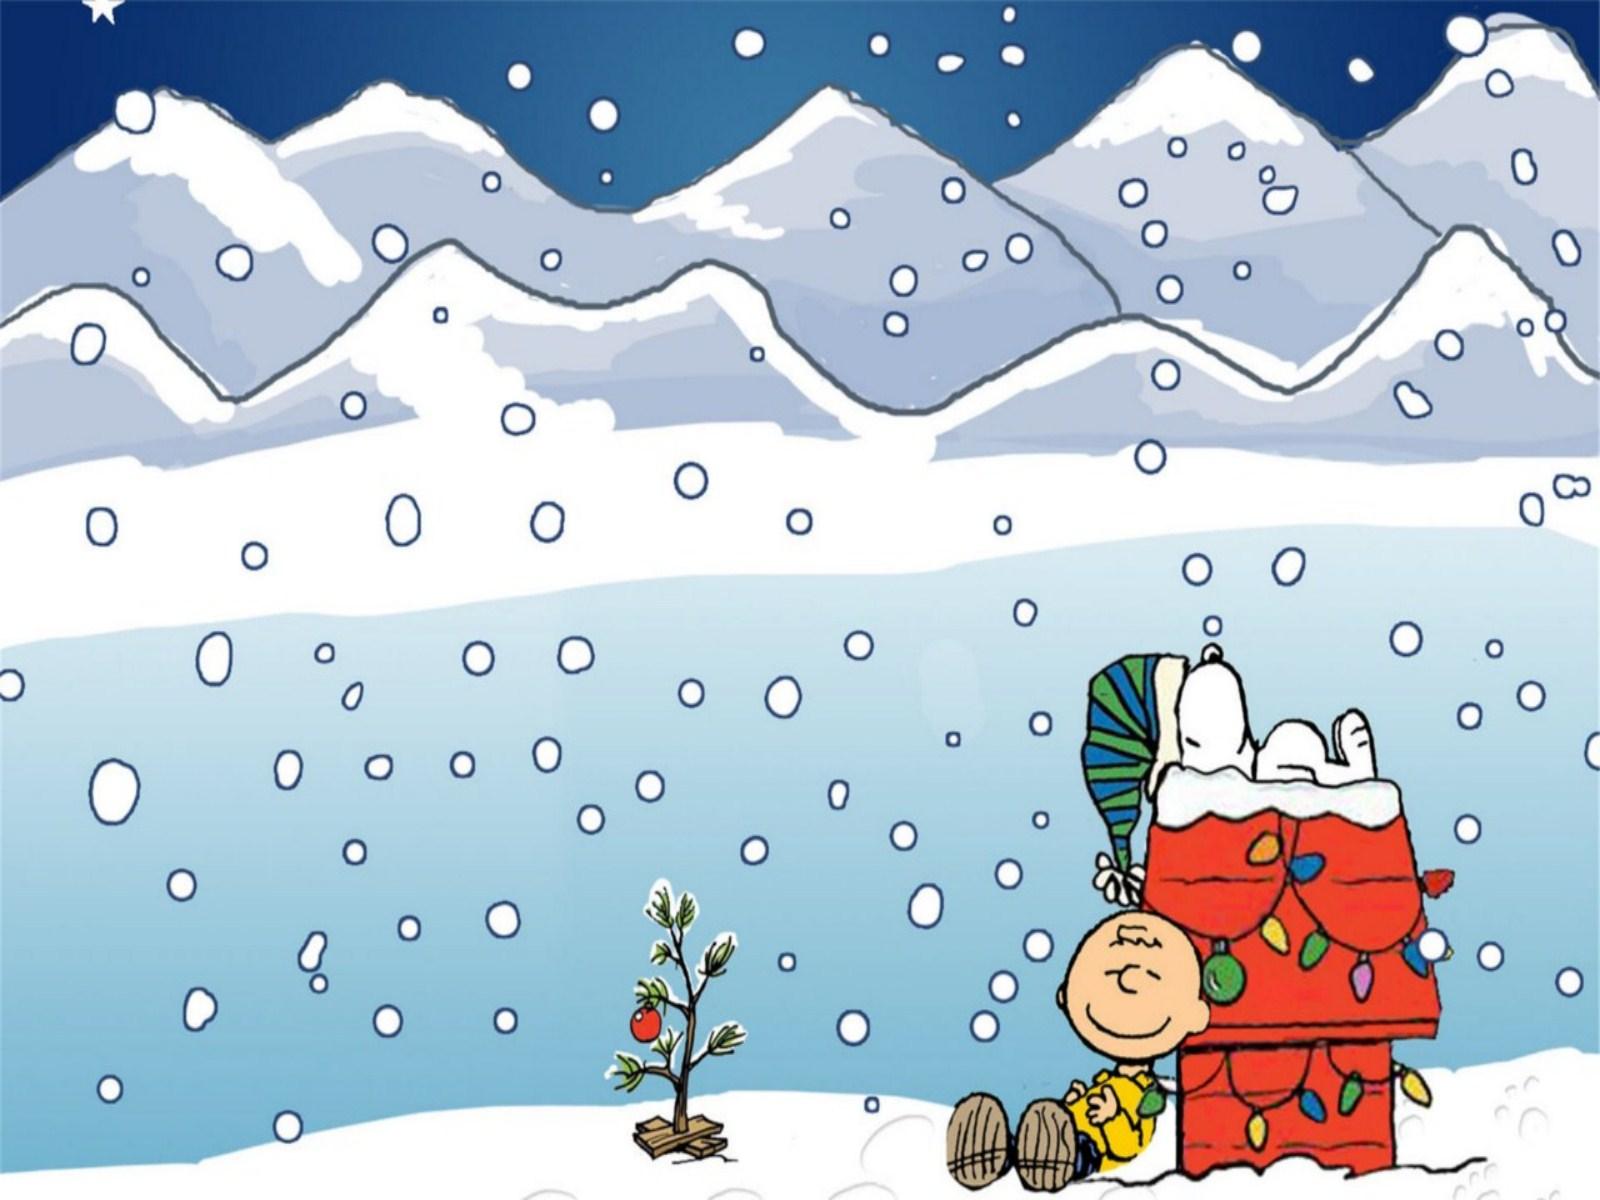 Wallpaper Mansion Charlie Brown Christmas Wallpaper 1600x1200